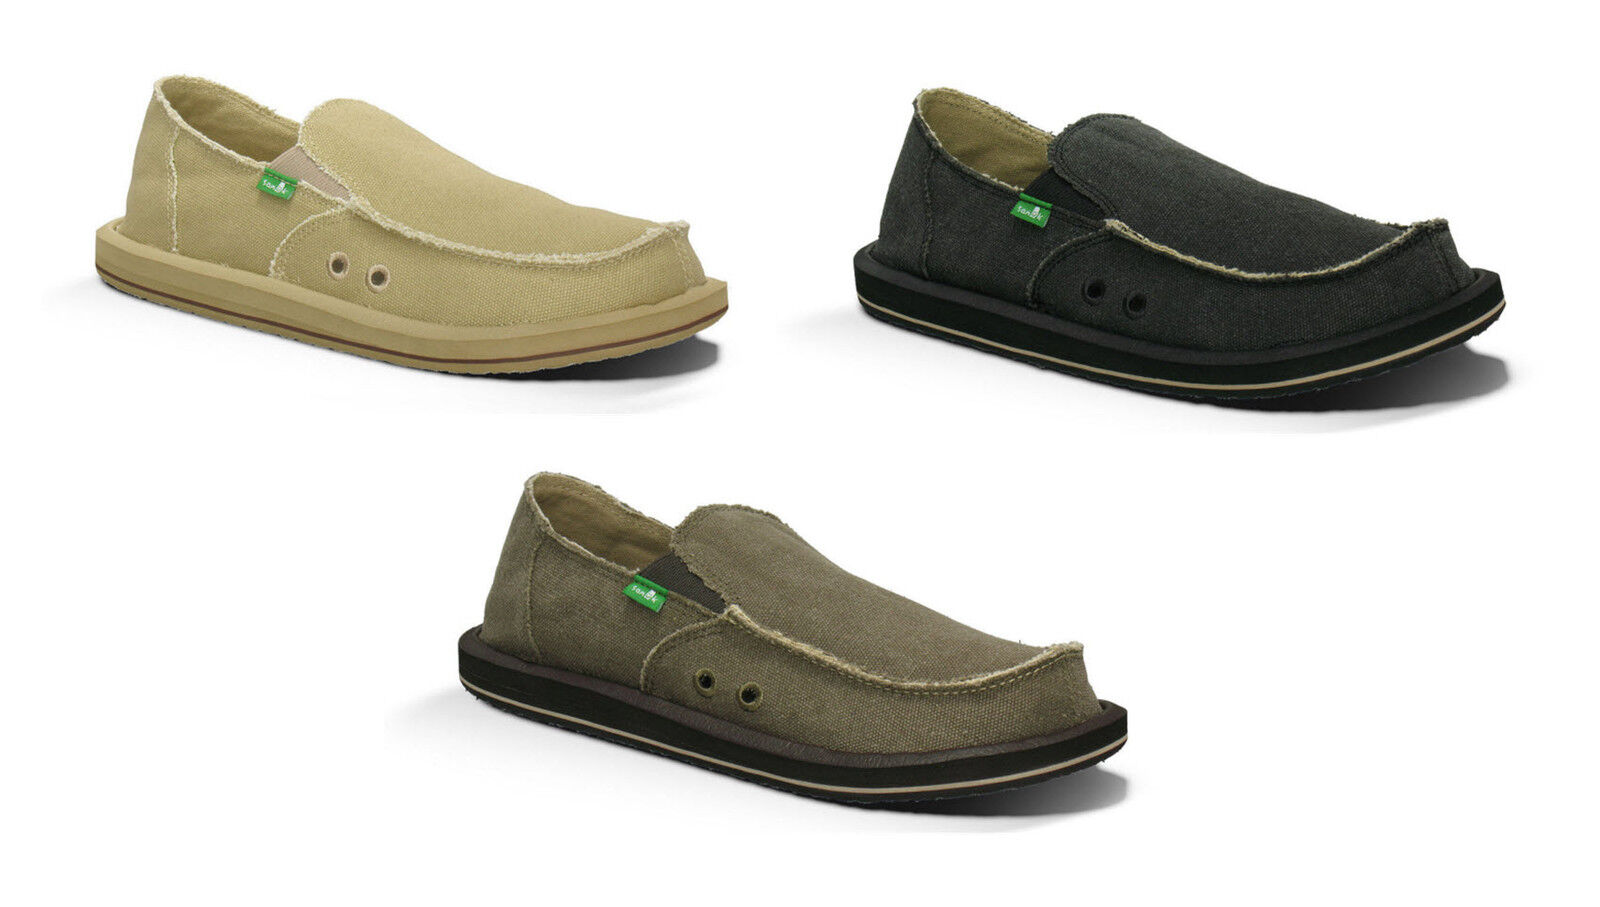 Scarpe casual da uomo  Sanuk Vagabond Sandali - - estate, Calzature, Slip On, lato Passeggiata Surfer, Scarpe